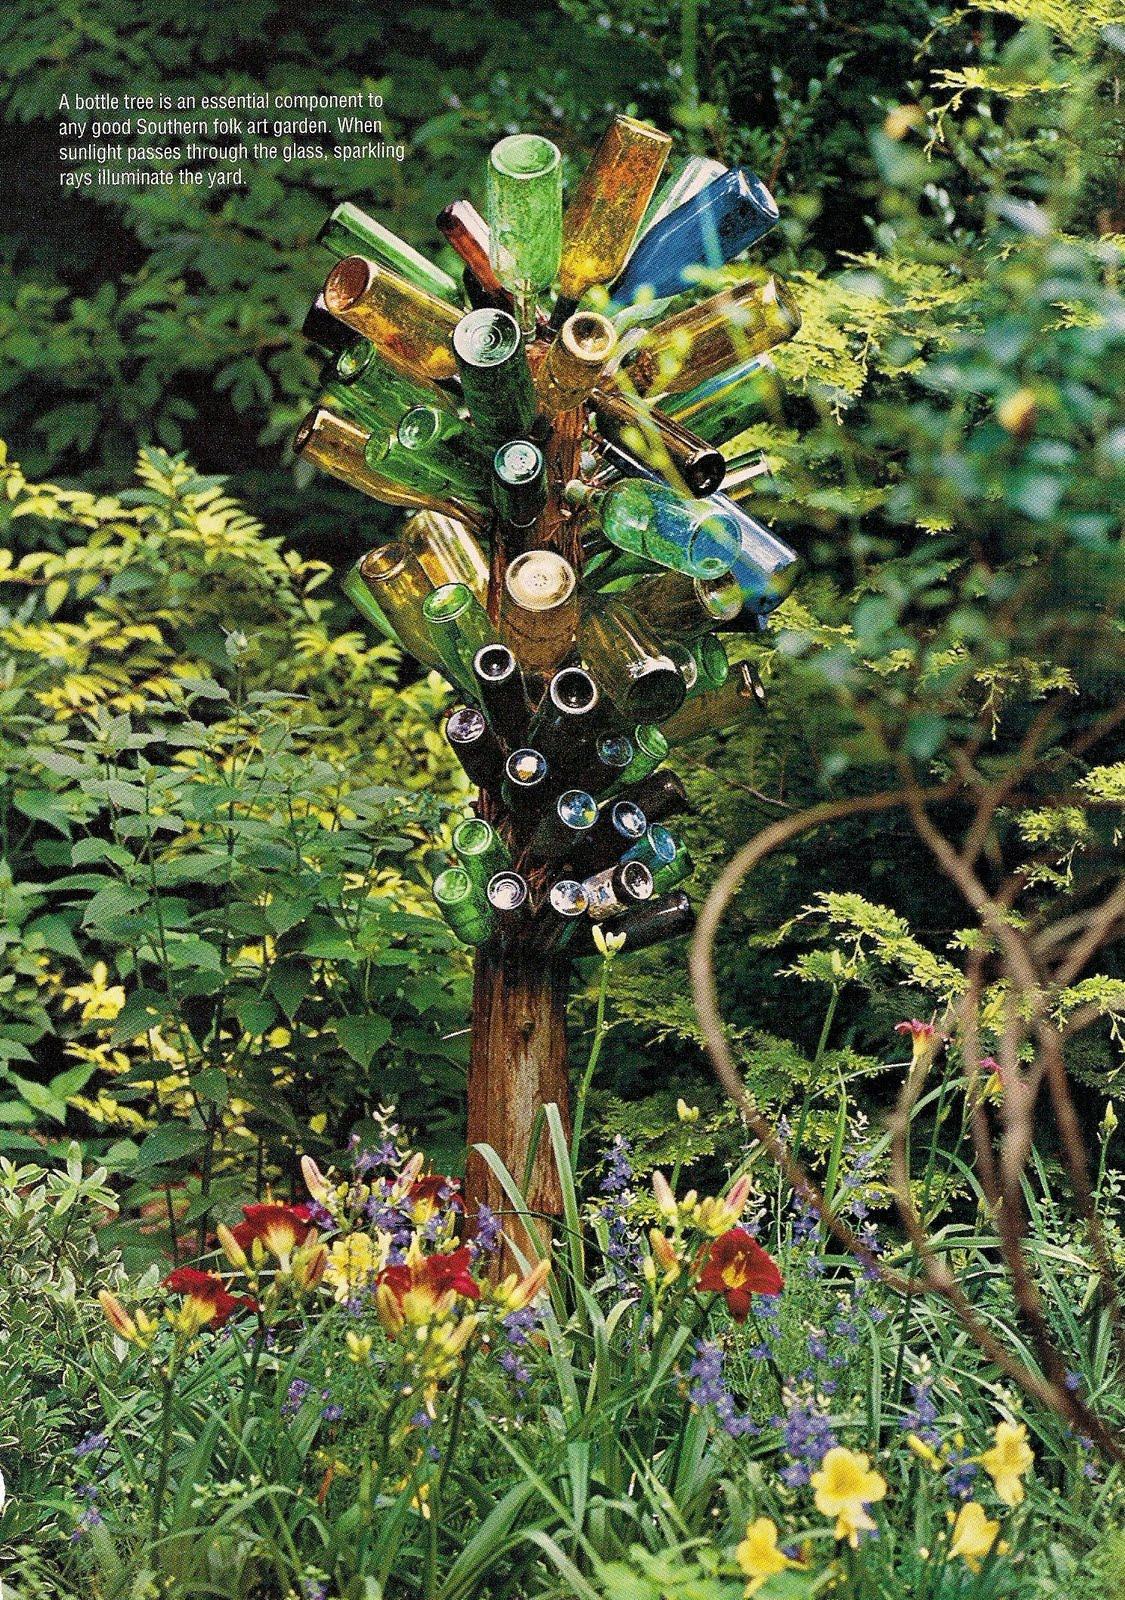 Bottle Trees in the Garden Landscape